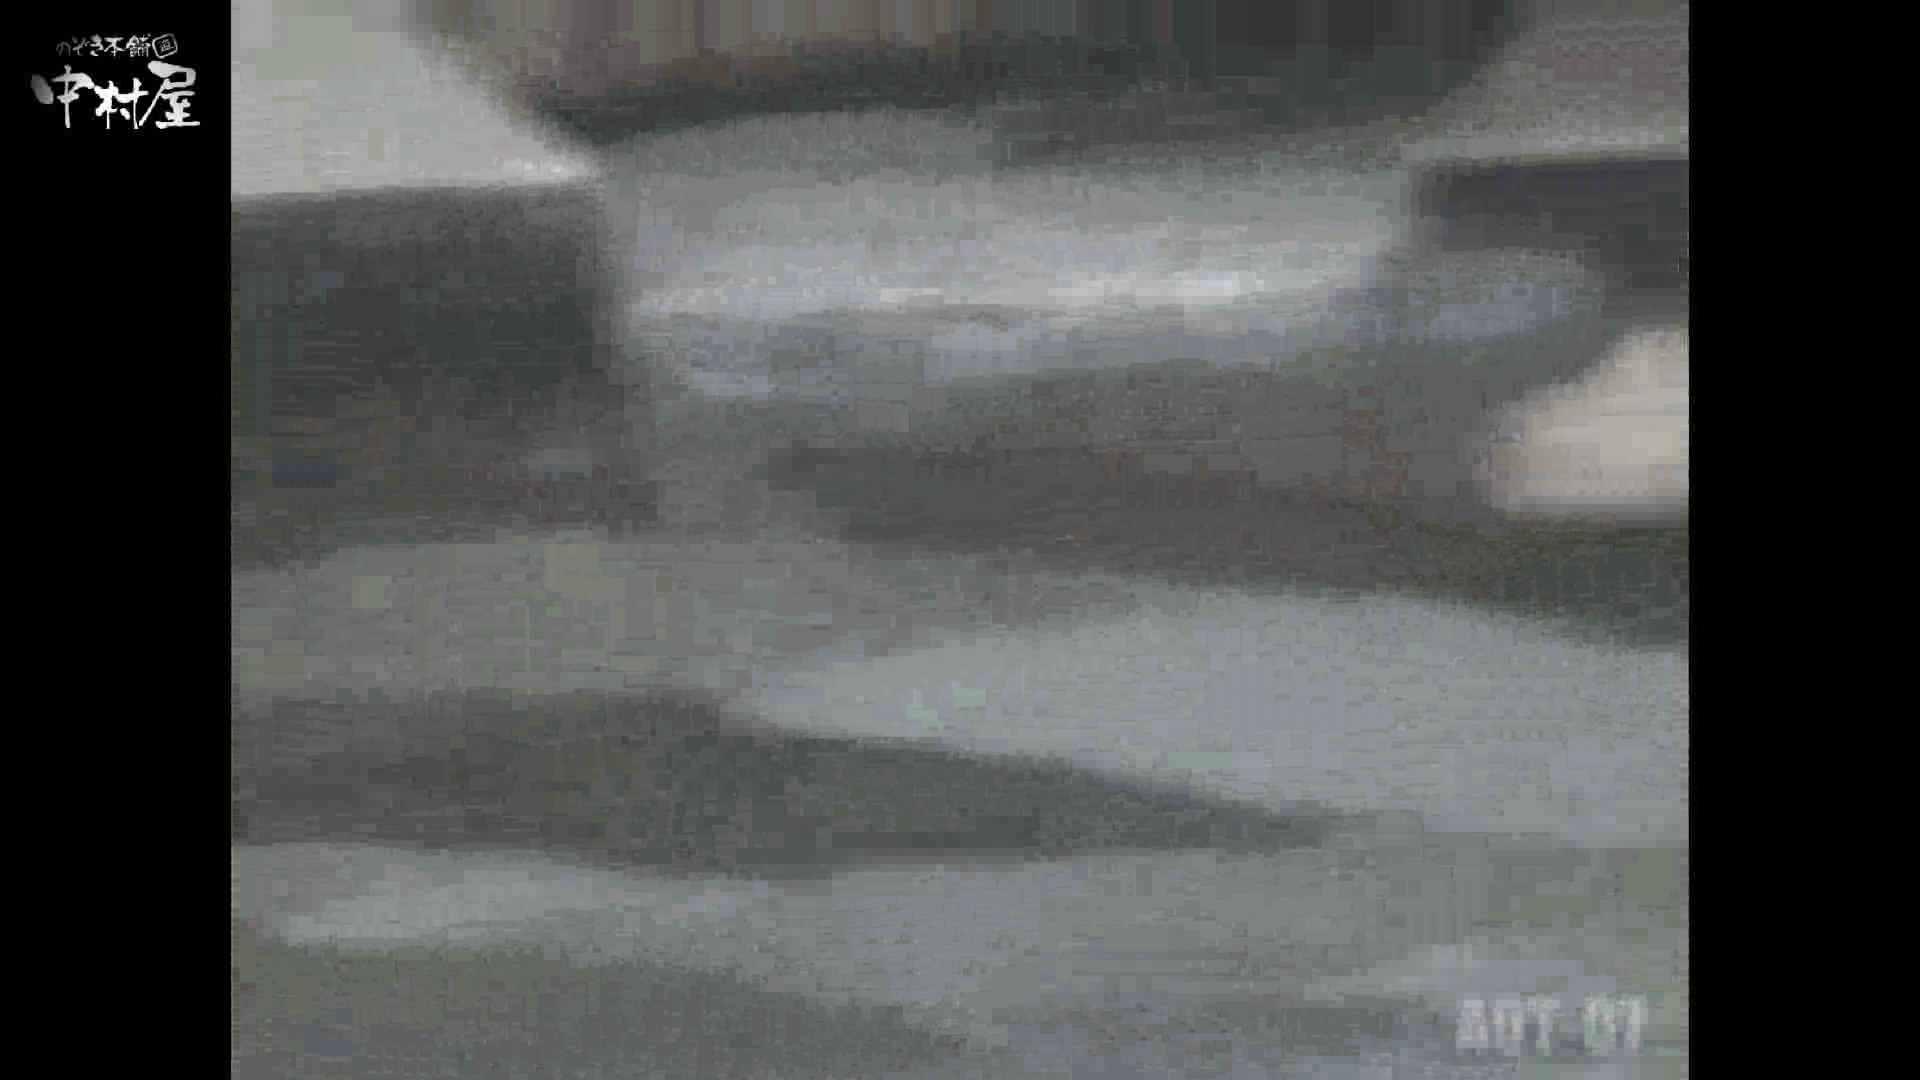 Aquaな露天風呂Vol.871潜入盗撮露天風呂七判湯 其の三 盗撮特集   露天  105画像 17